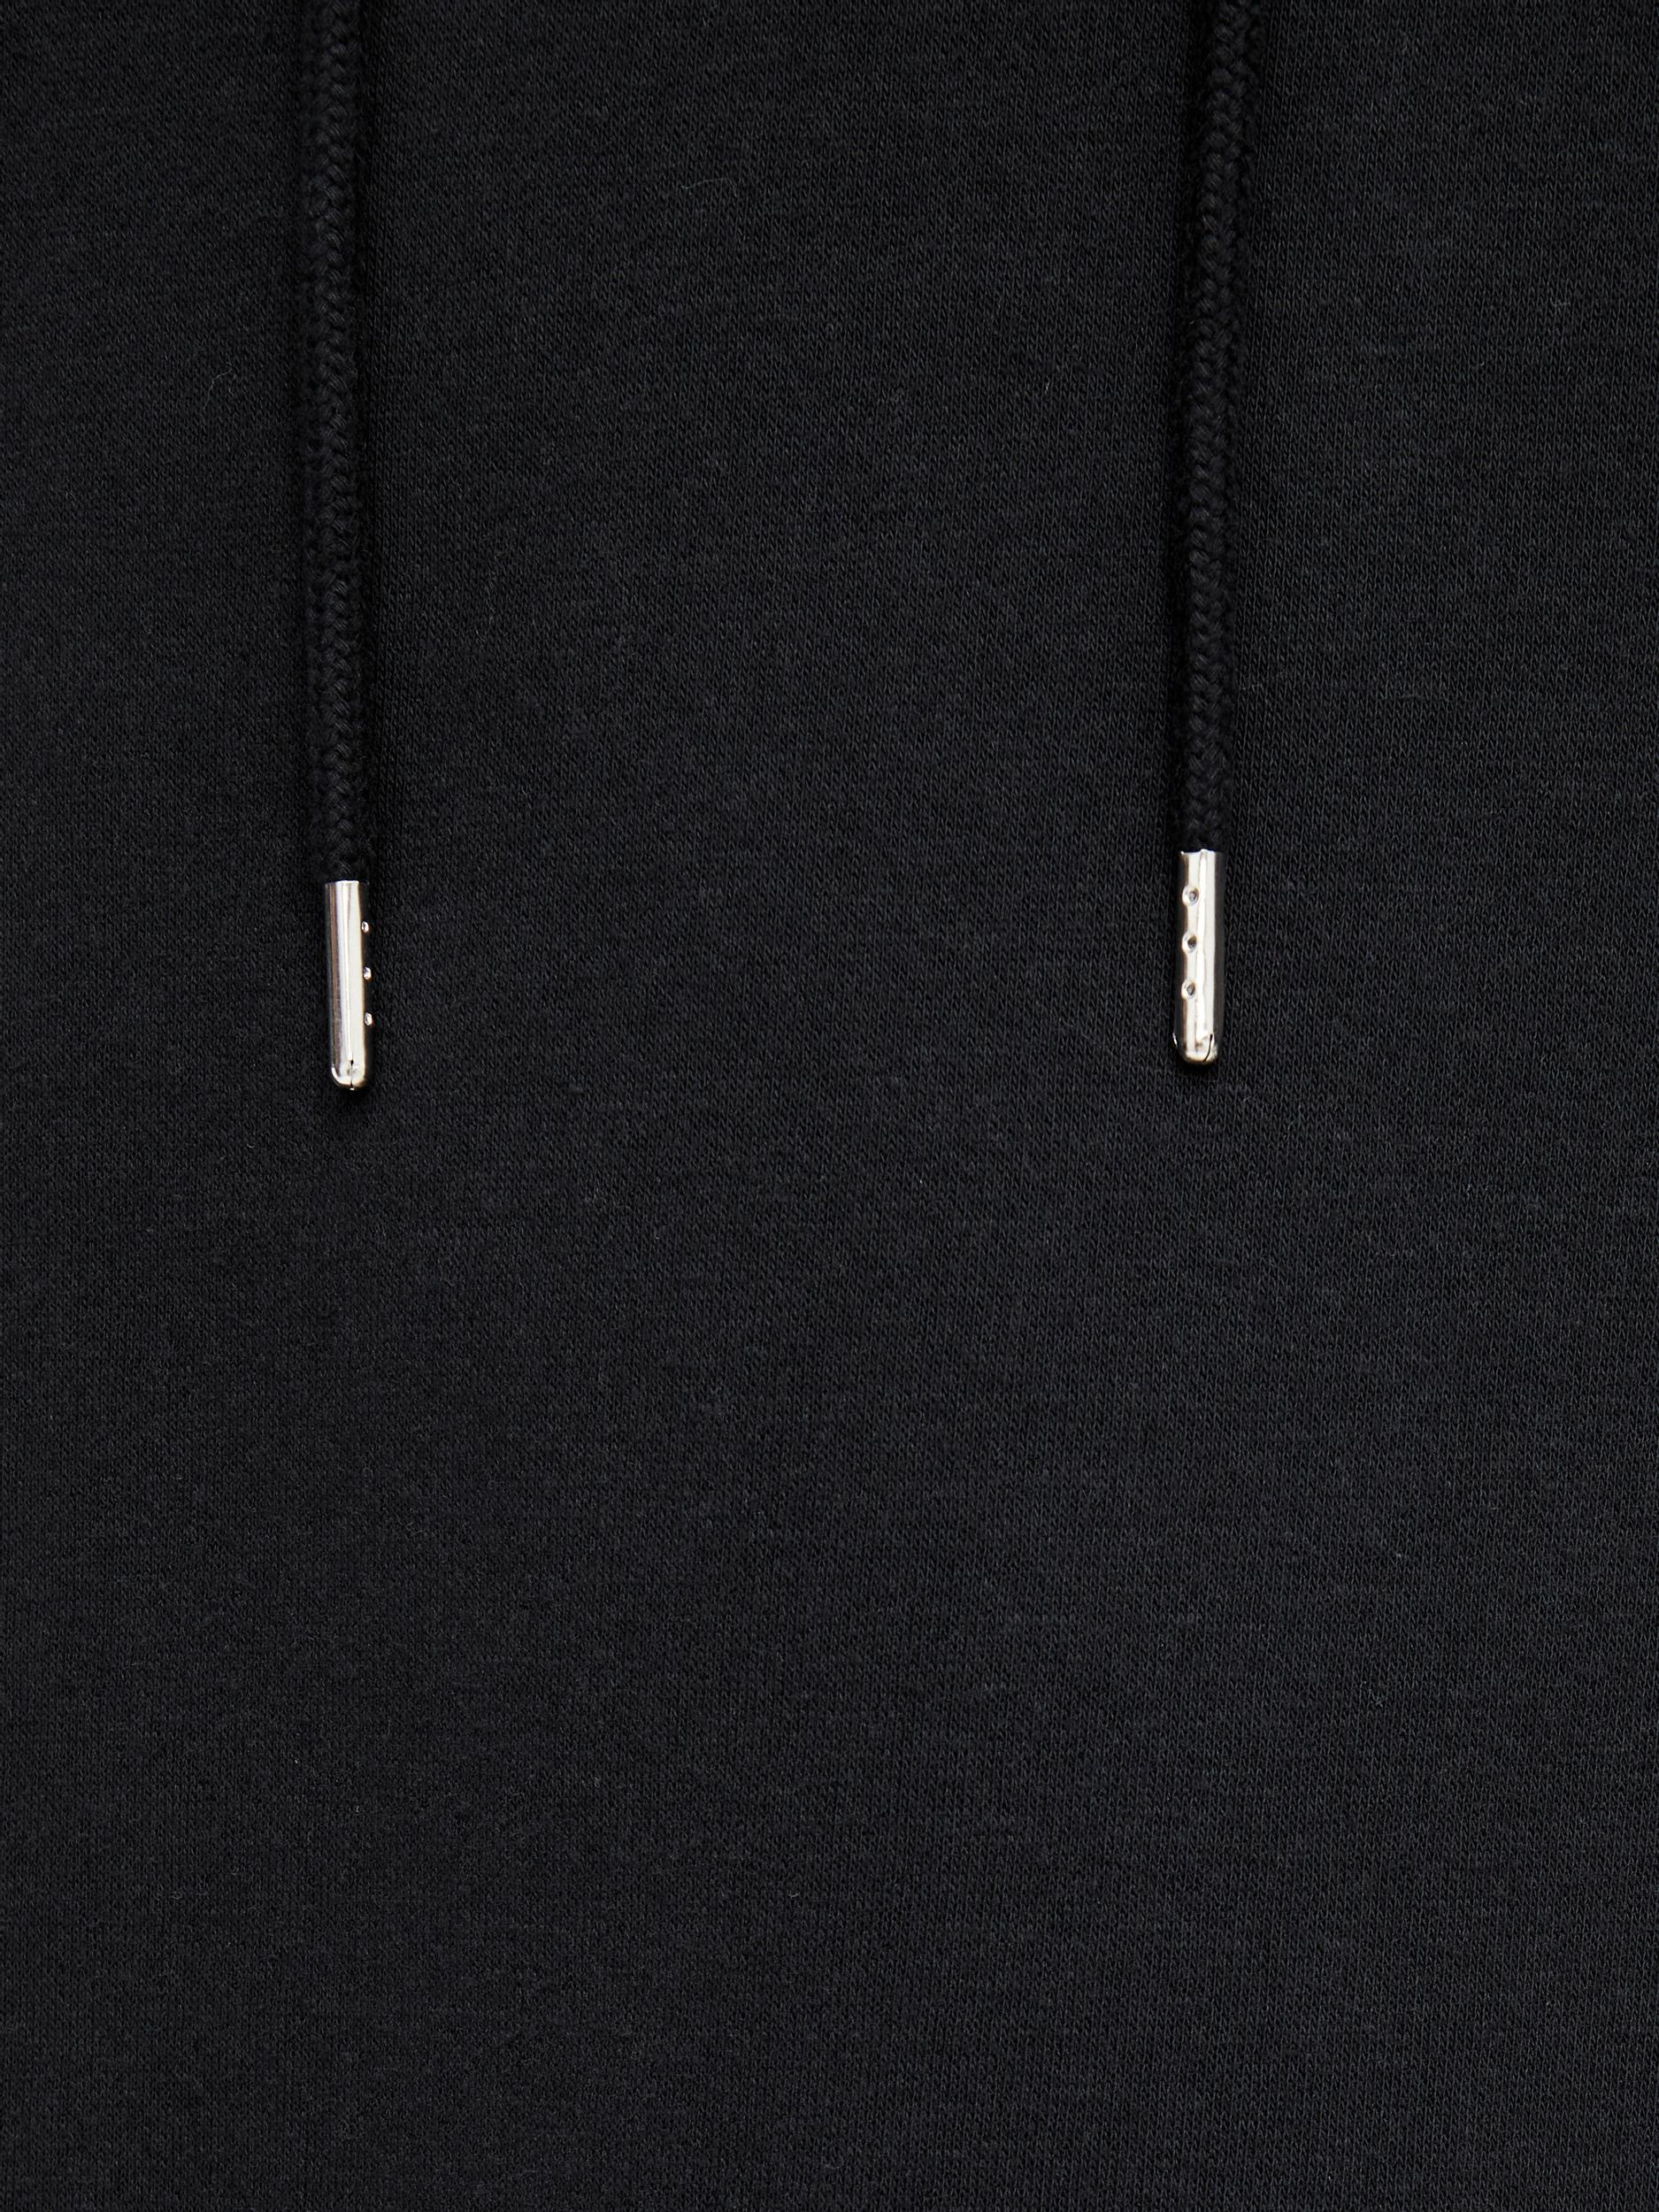 Pieces Chilli LS sweatkjole, black, medium